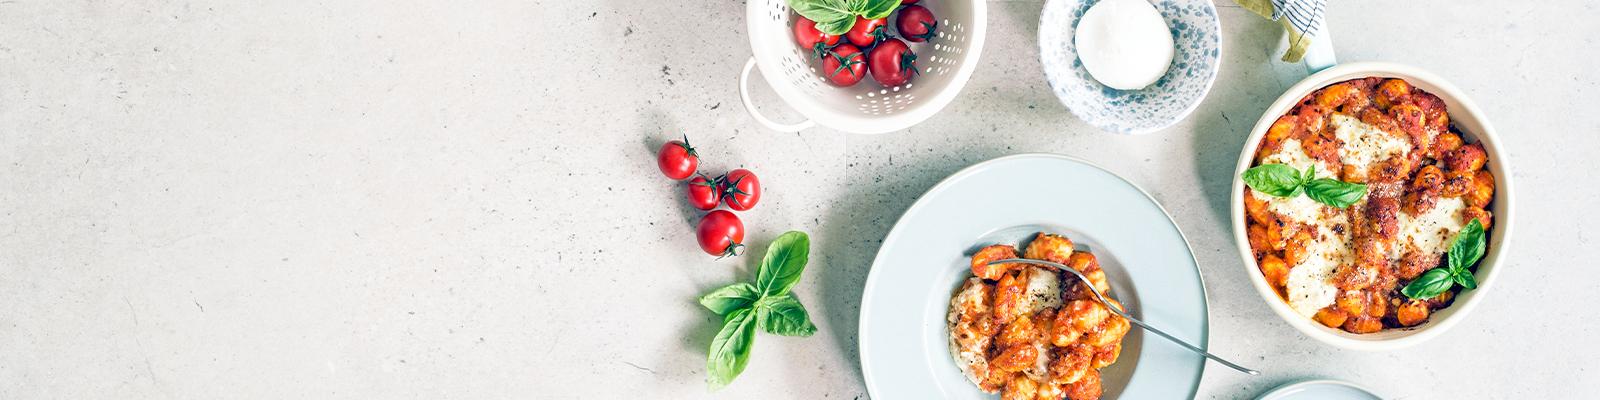 Pasta Garofalo - Gnocchis